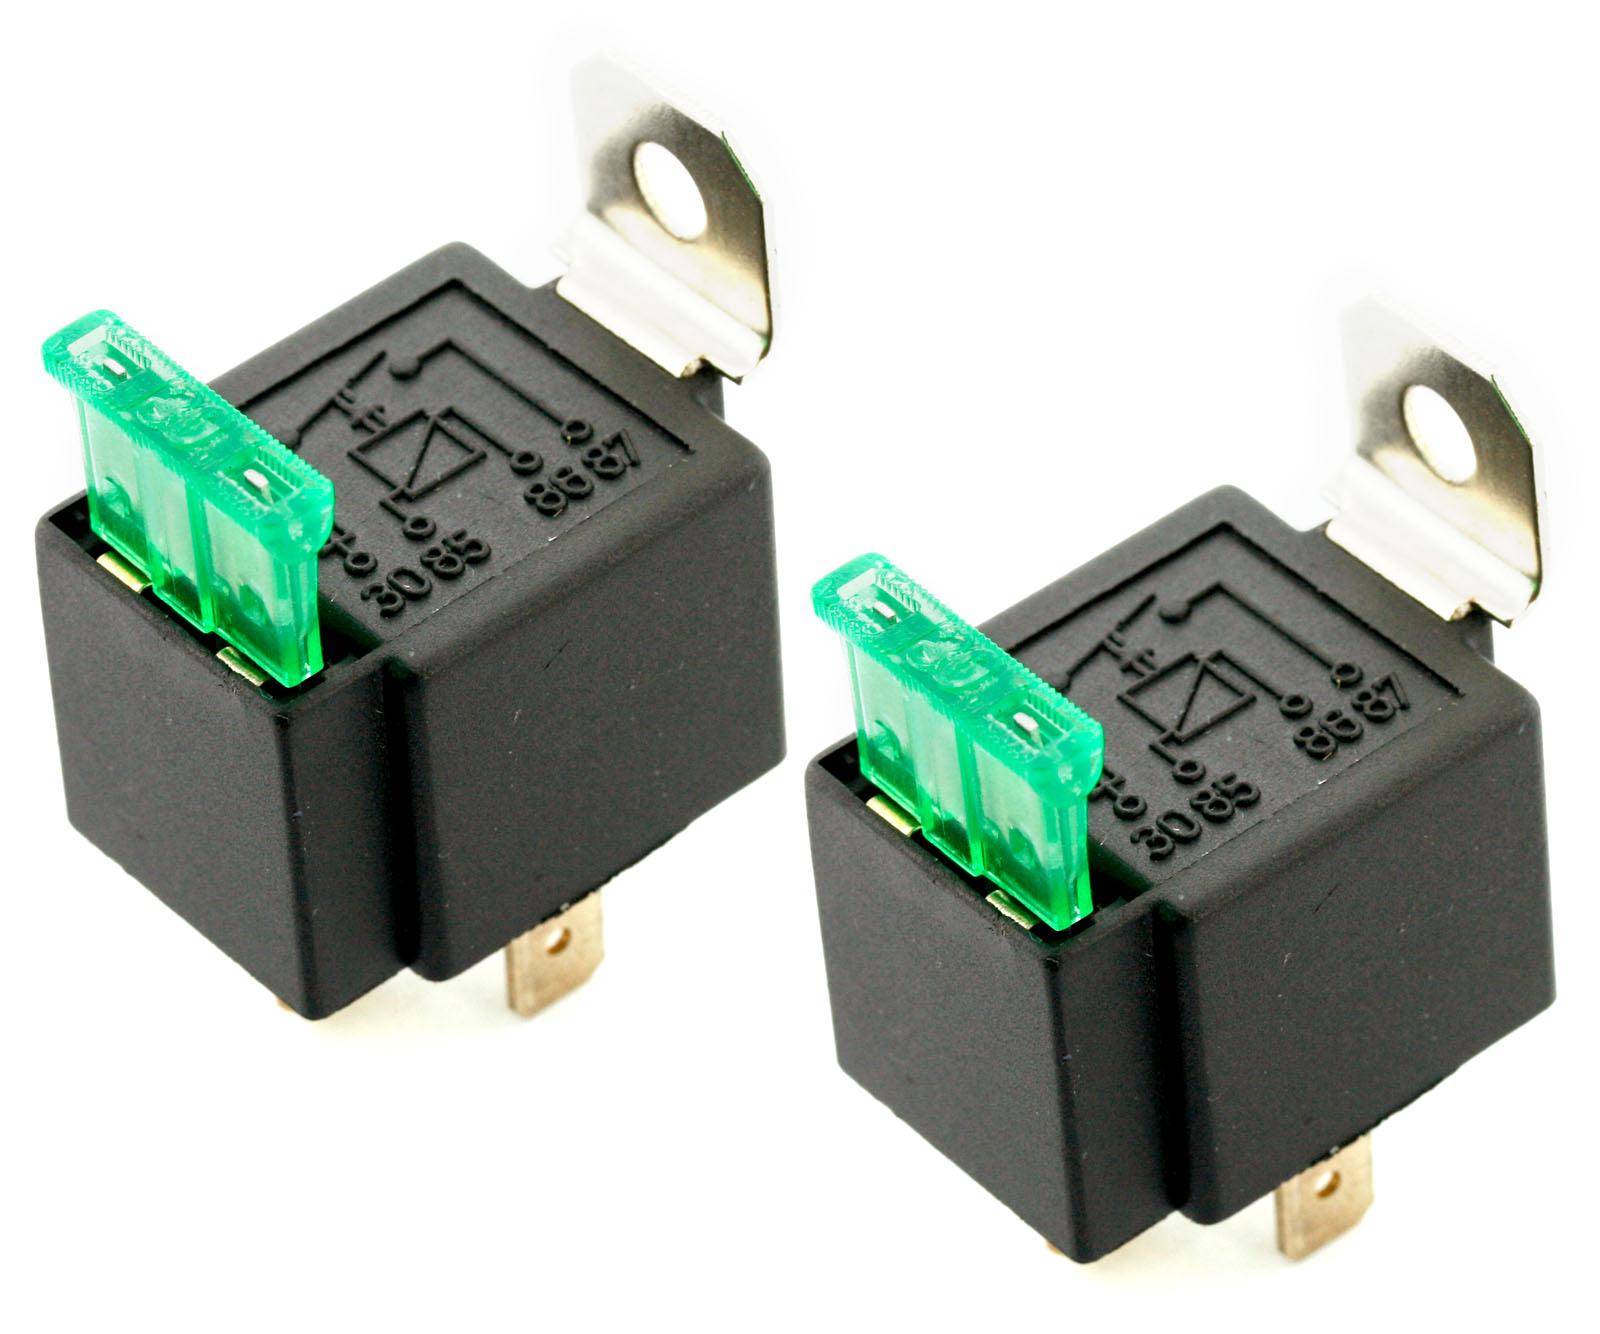 2pcs 12v 30 Amp On Off Switch 4 Pin Fused Relay Uk Q86